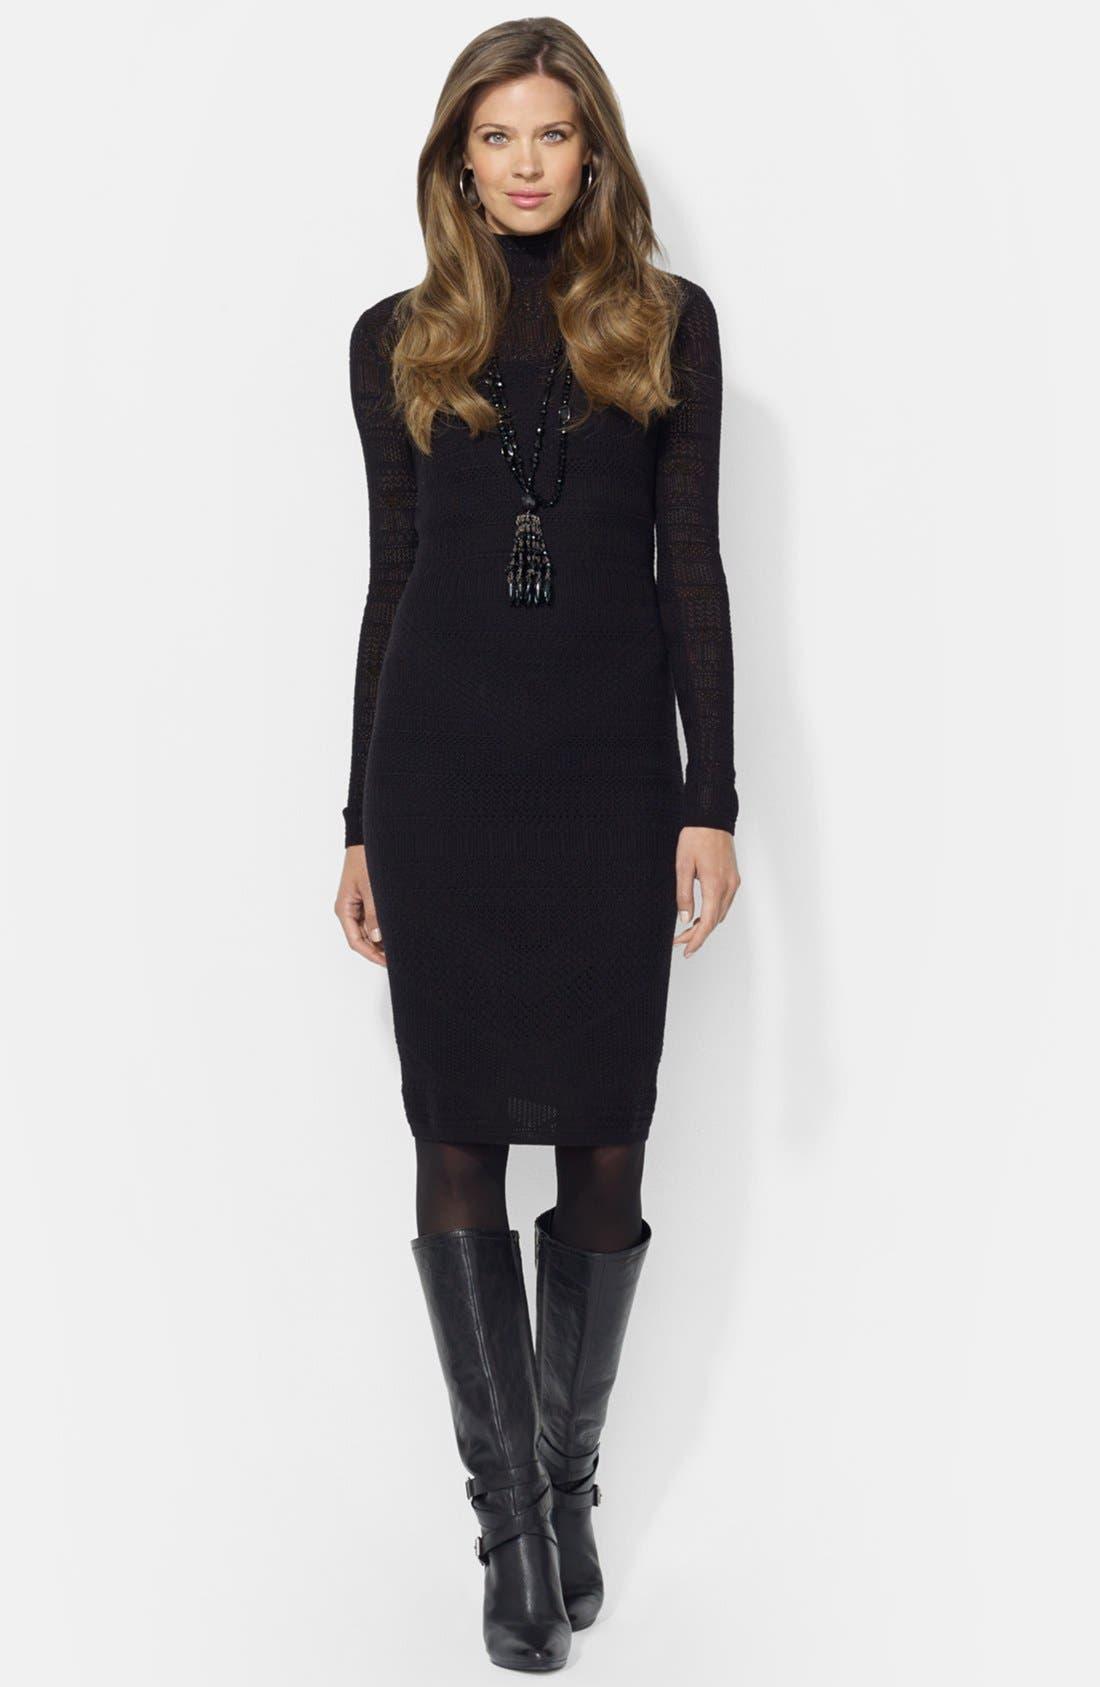 Alternate Image 1 Selected - Lauren Ralph Lauren Mock Neck Pointelle Sweater Dress (Petite)